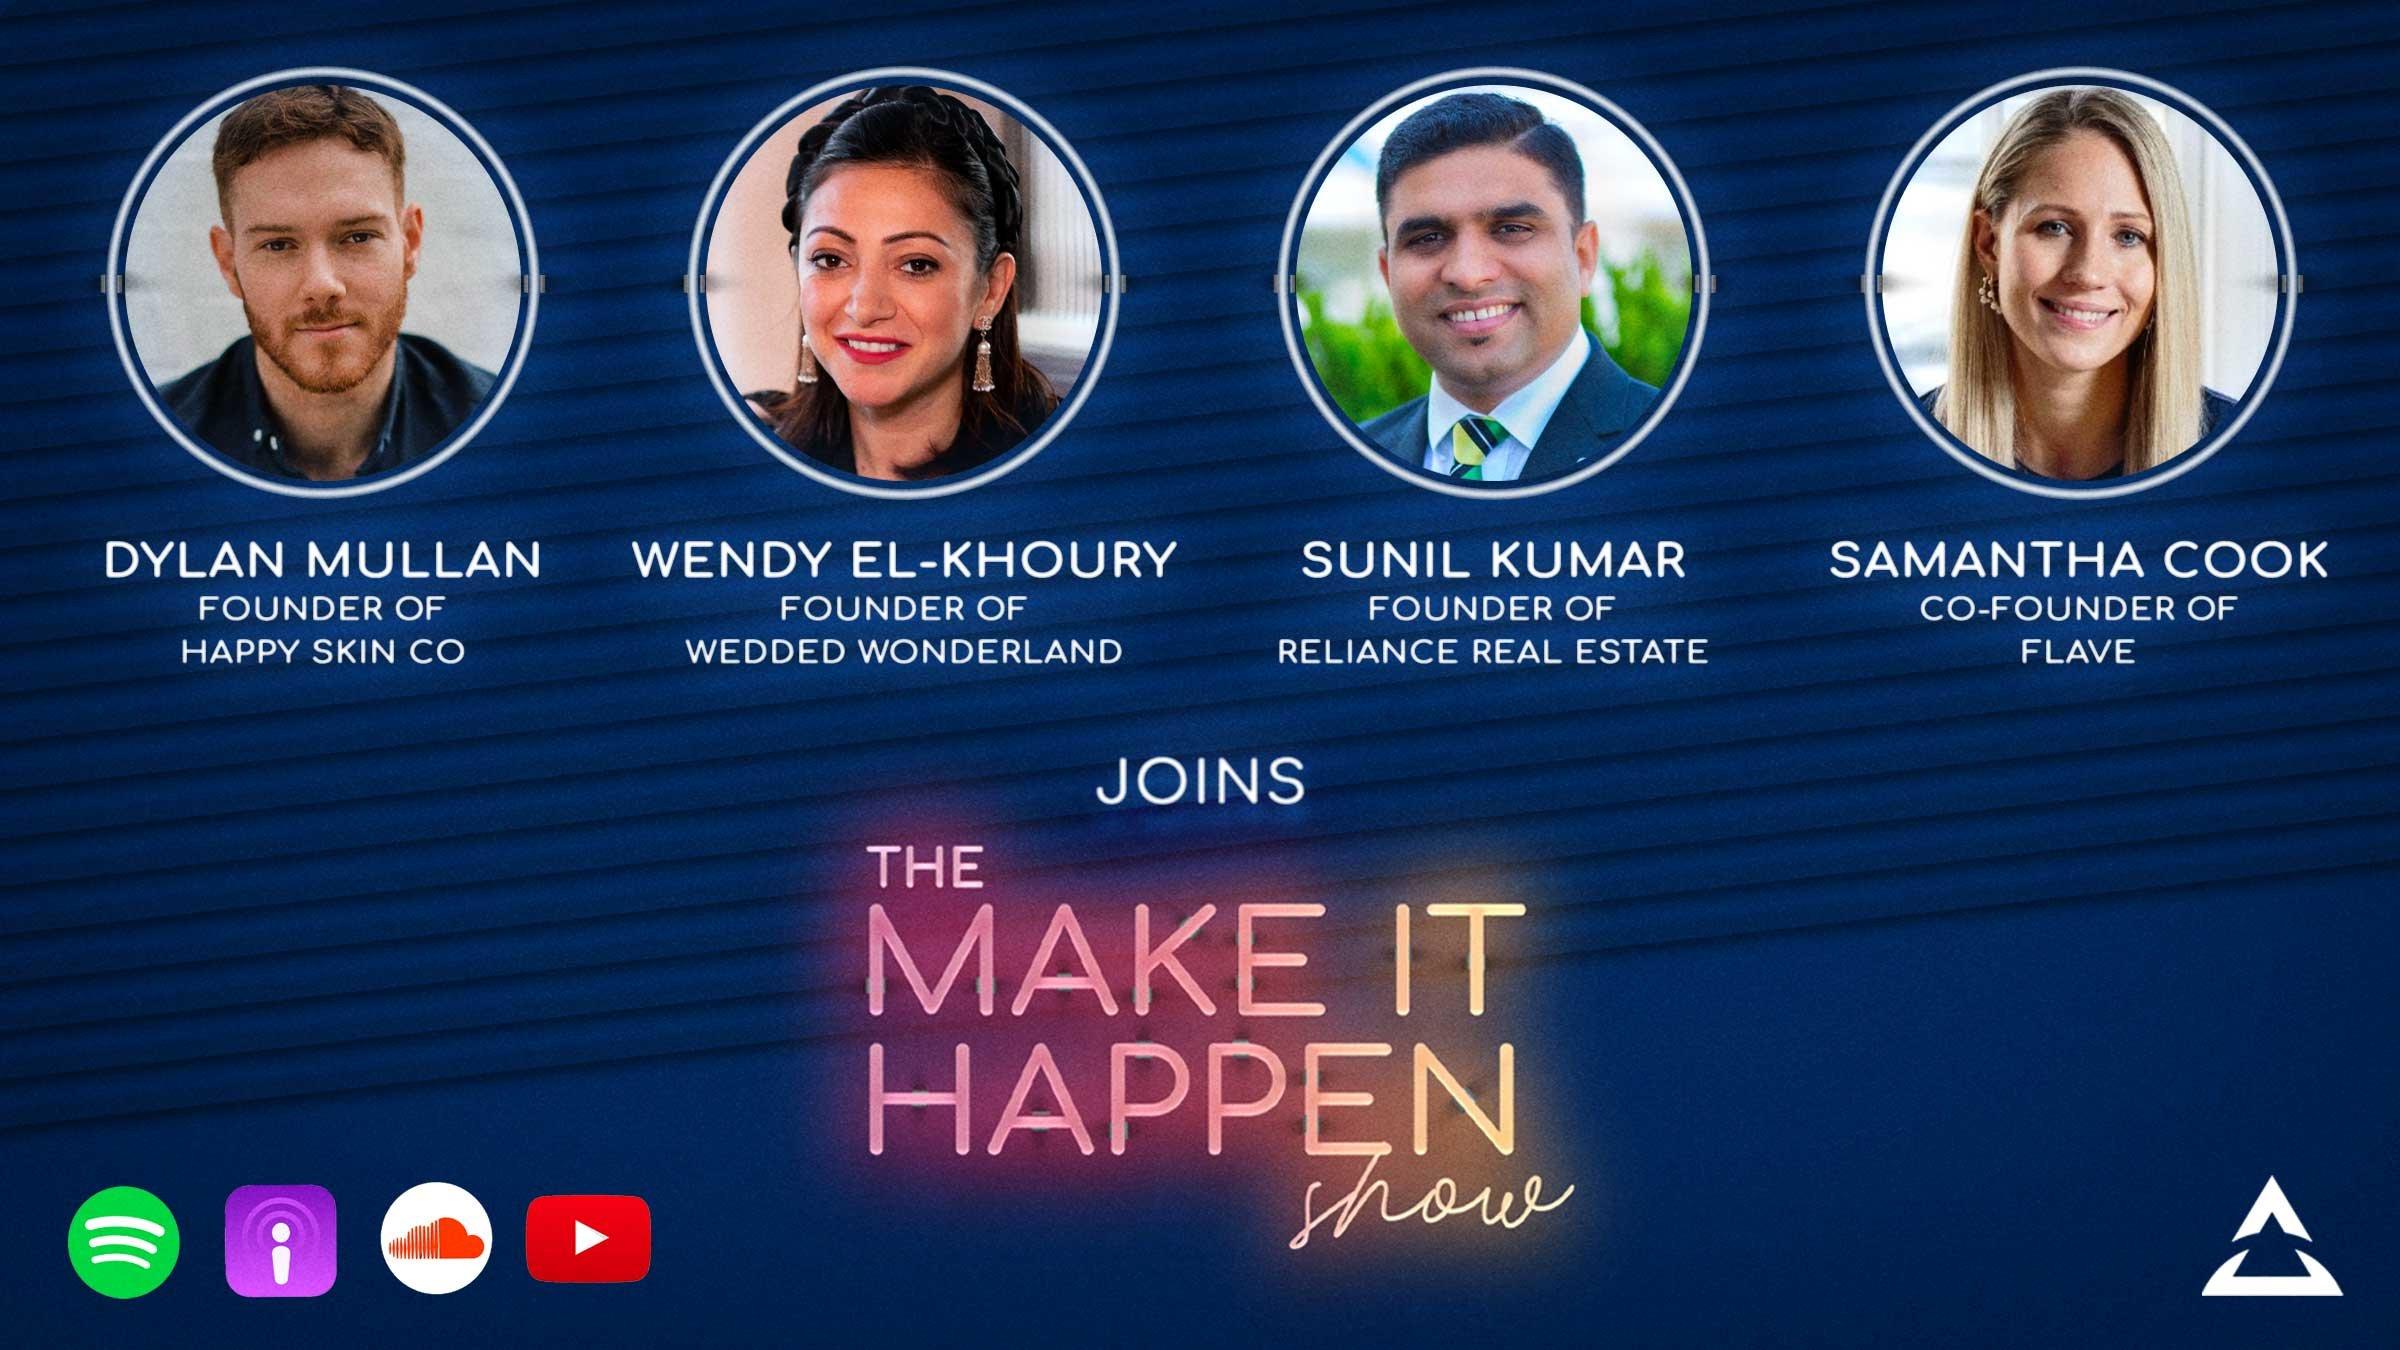 Dylan Mullan (Happy Skin Co), Wendy El-houry (Wedded Wonderland), Sunil Kumar (Reliance Real Estate), Samantha Cook (Flave) join The Make It Happen Show